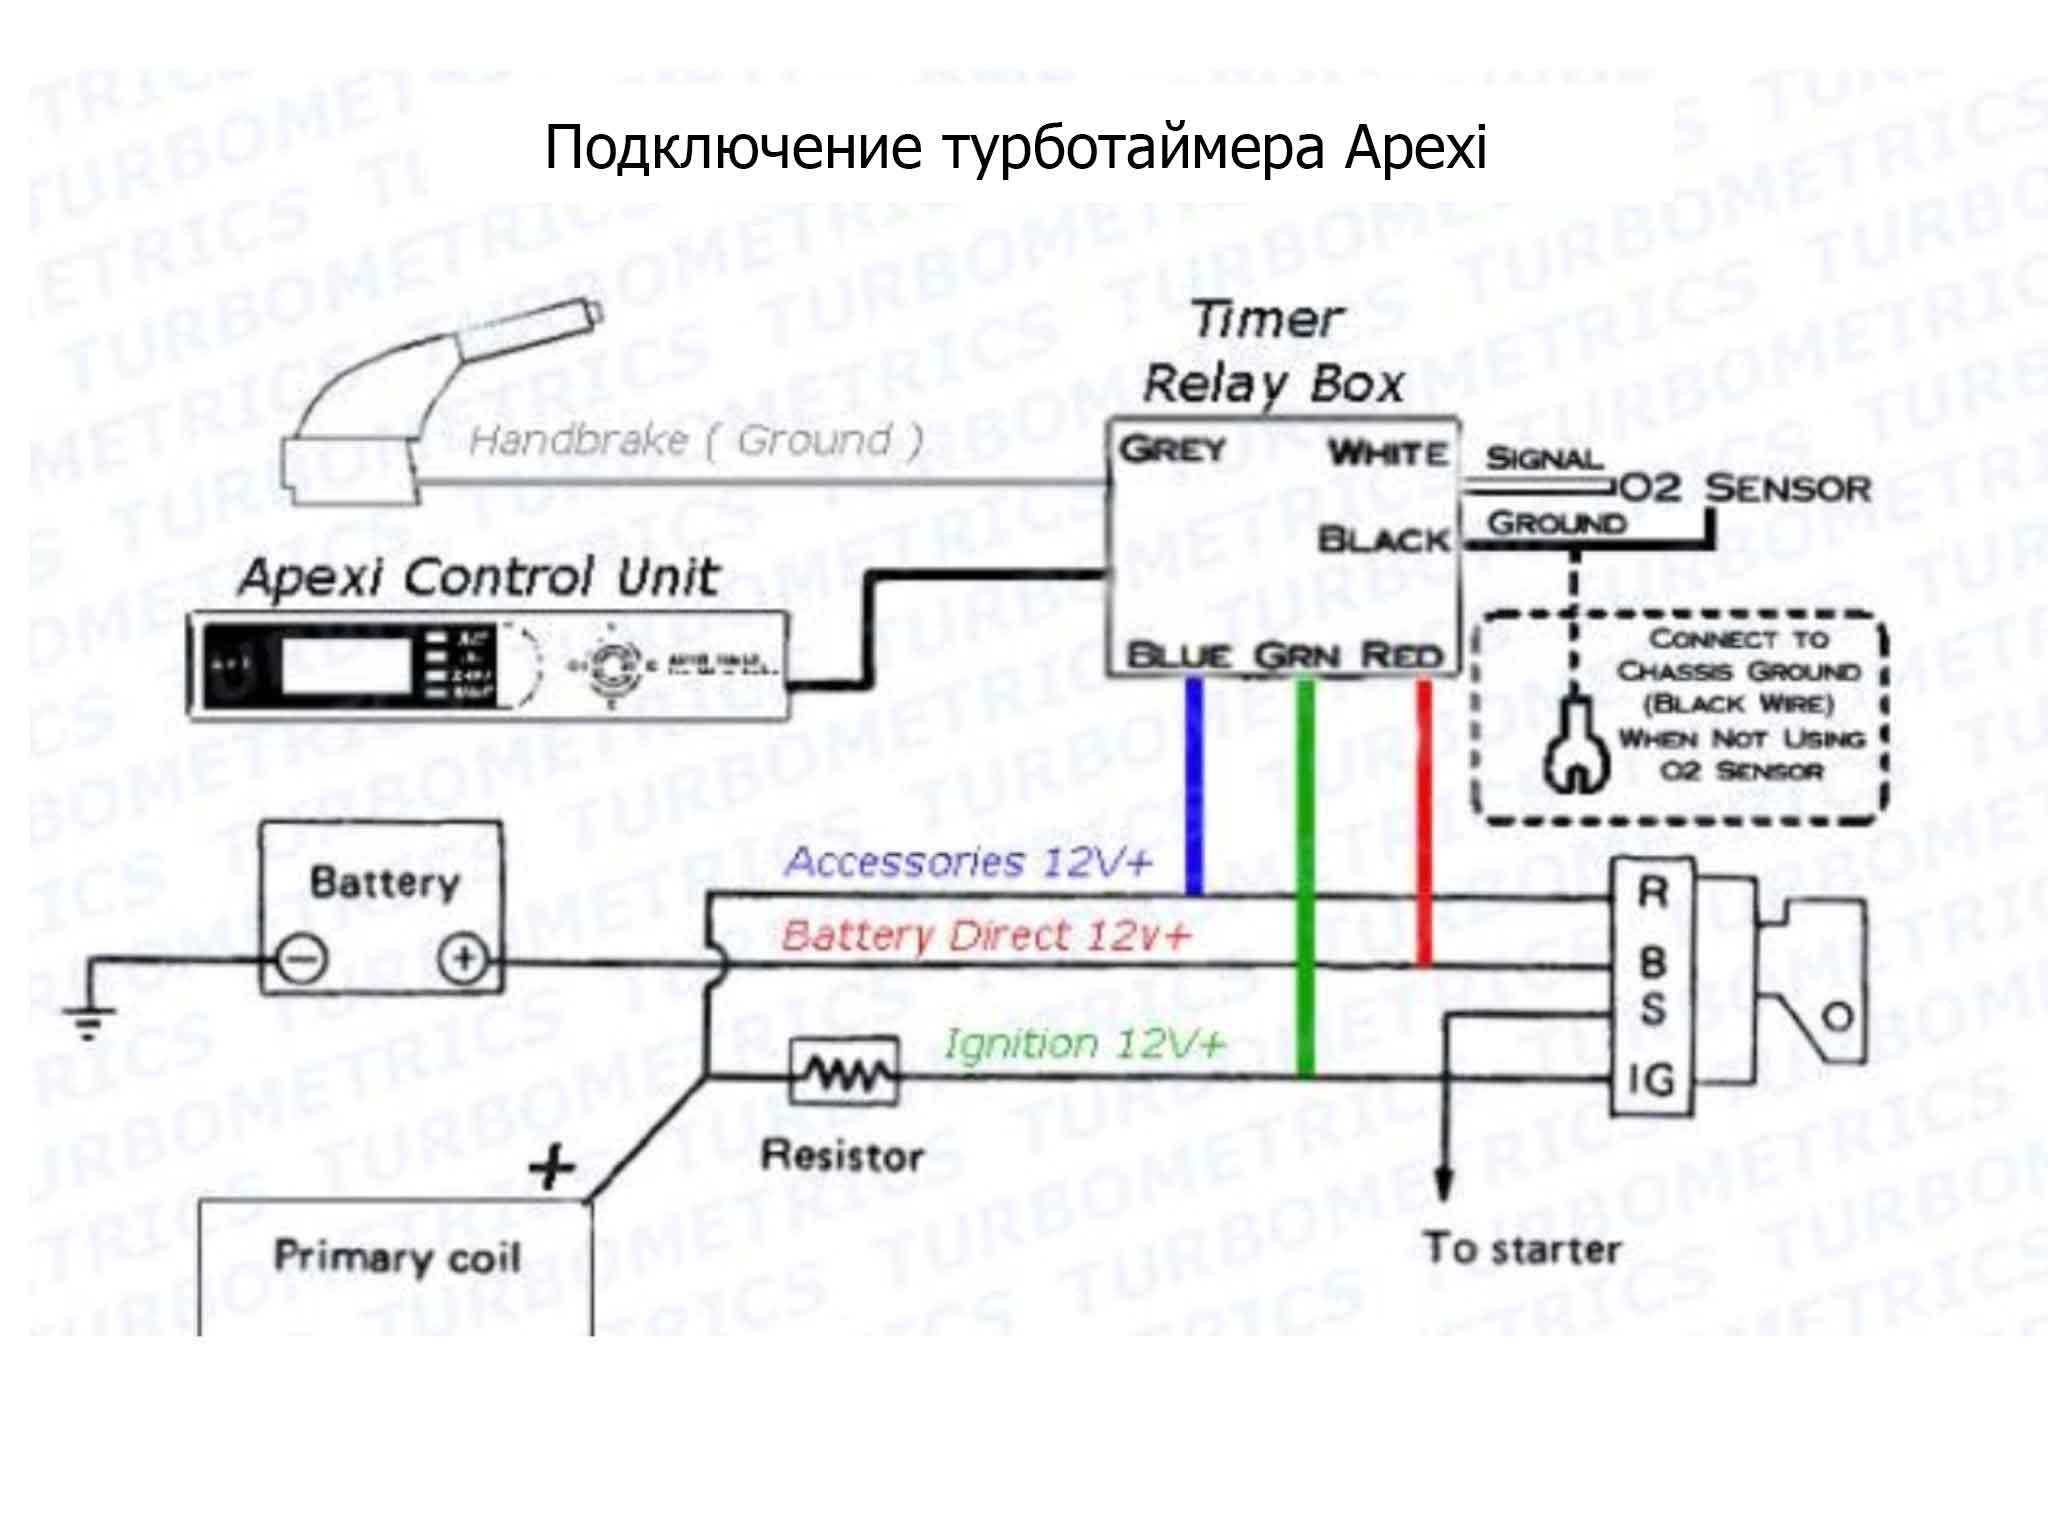 Схема подключения турботаймера 24в(Аналогична как и в версии на 12в )